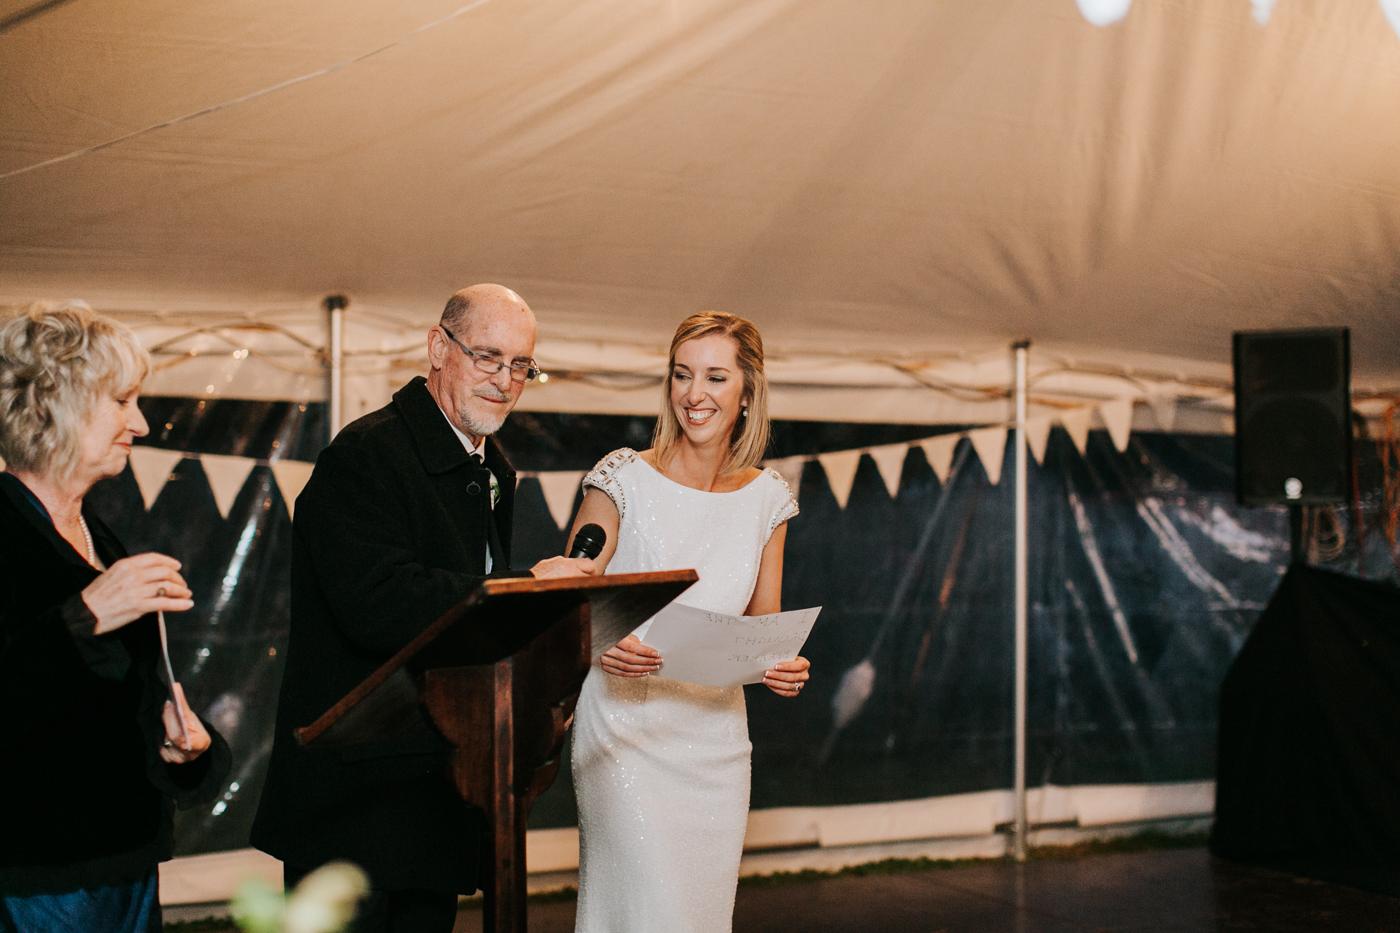 Bridget & James - Orange Country Wedding - Samantha Heather Photography-215.jpg